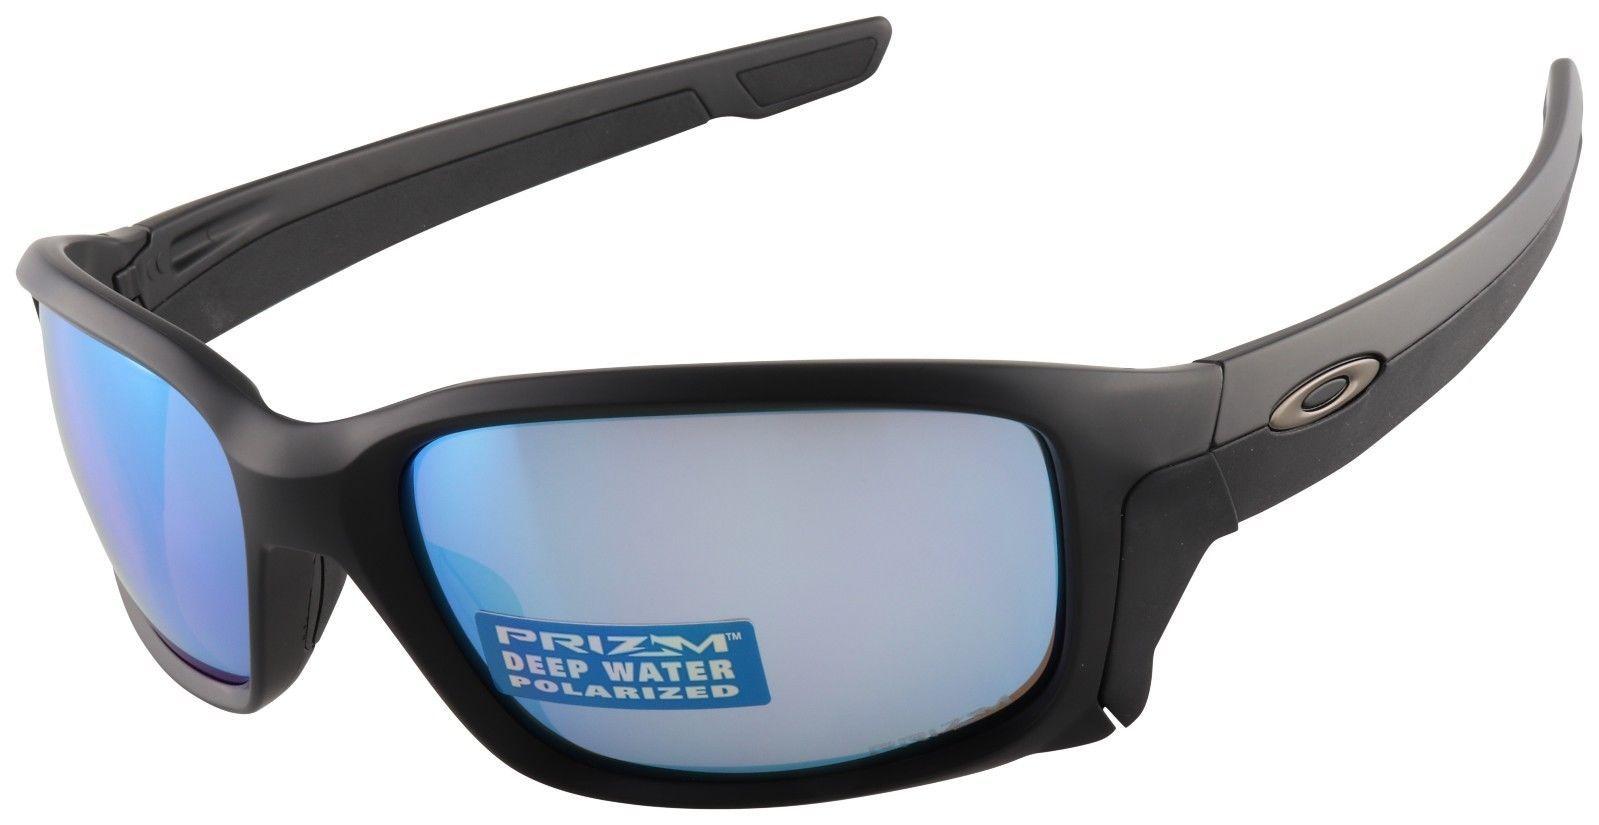 b6ecc43b0c6 Oakley Straightlink Sunglasses OO9331-05 Matte Black